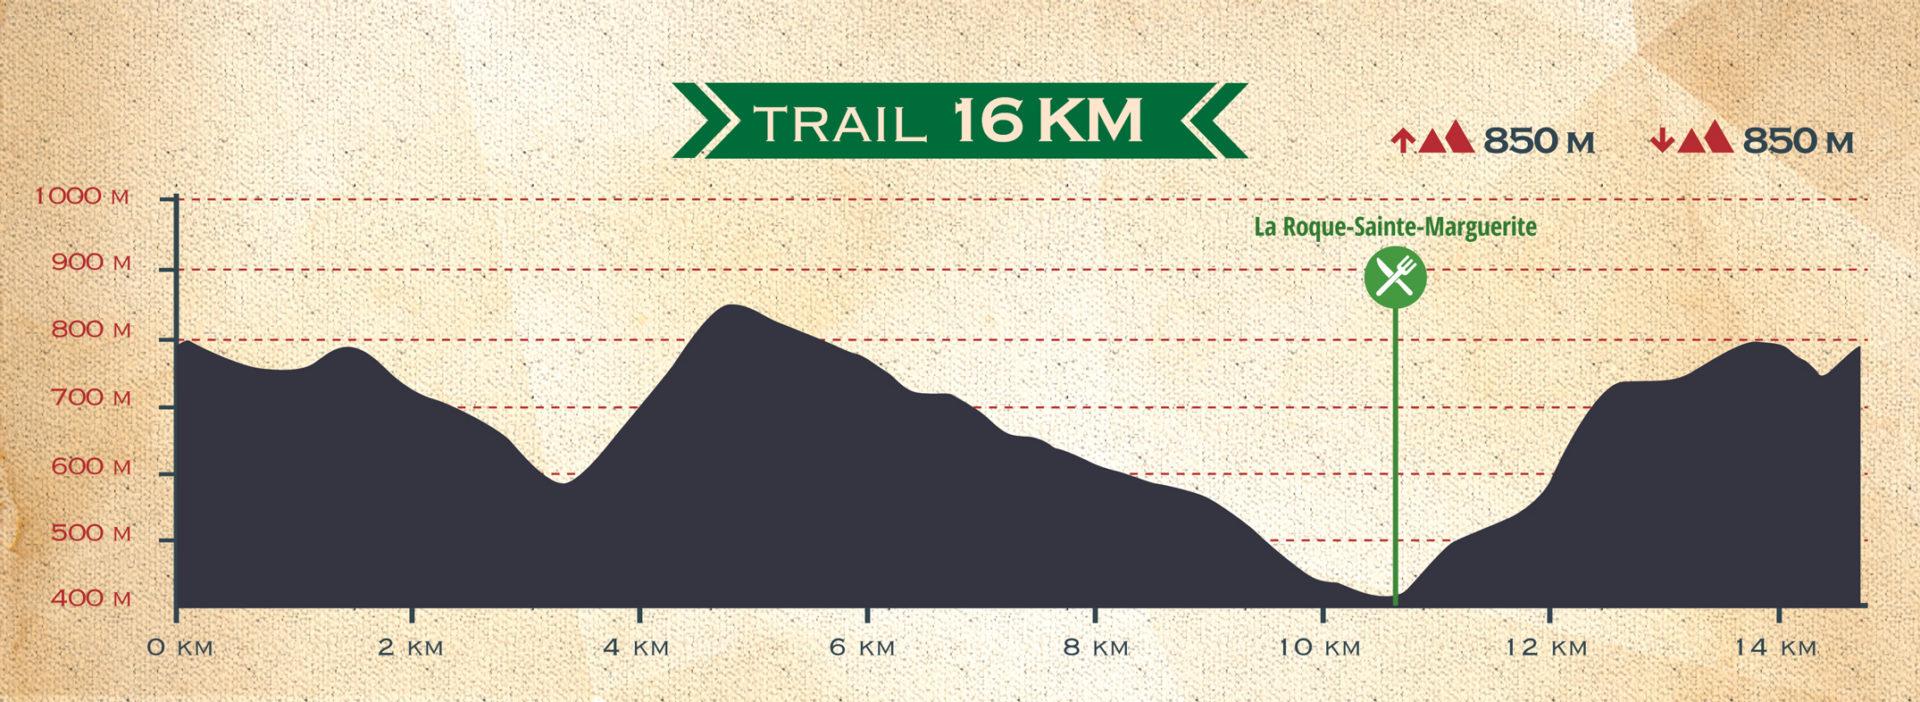 profil-16kms